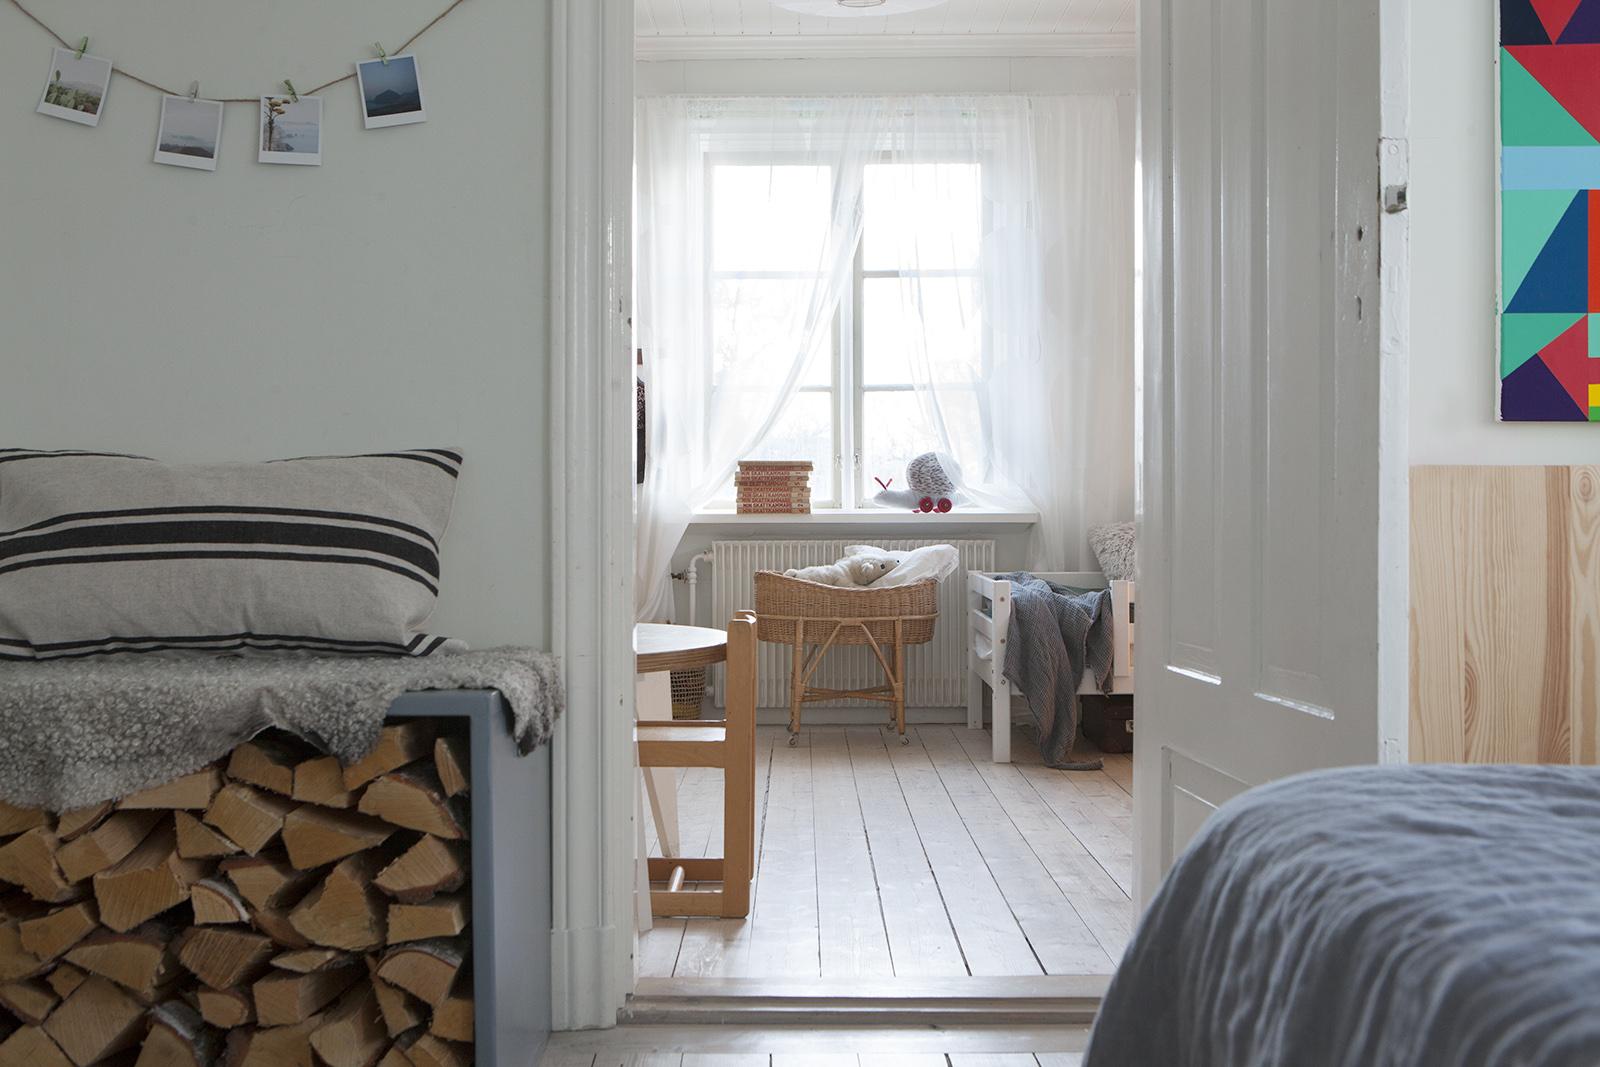 Amelie von Essen Amelies hus Inredningsinspiration inredningsblogg